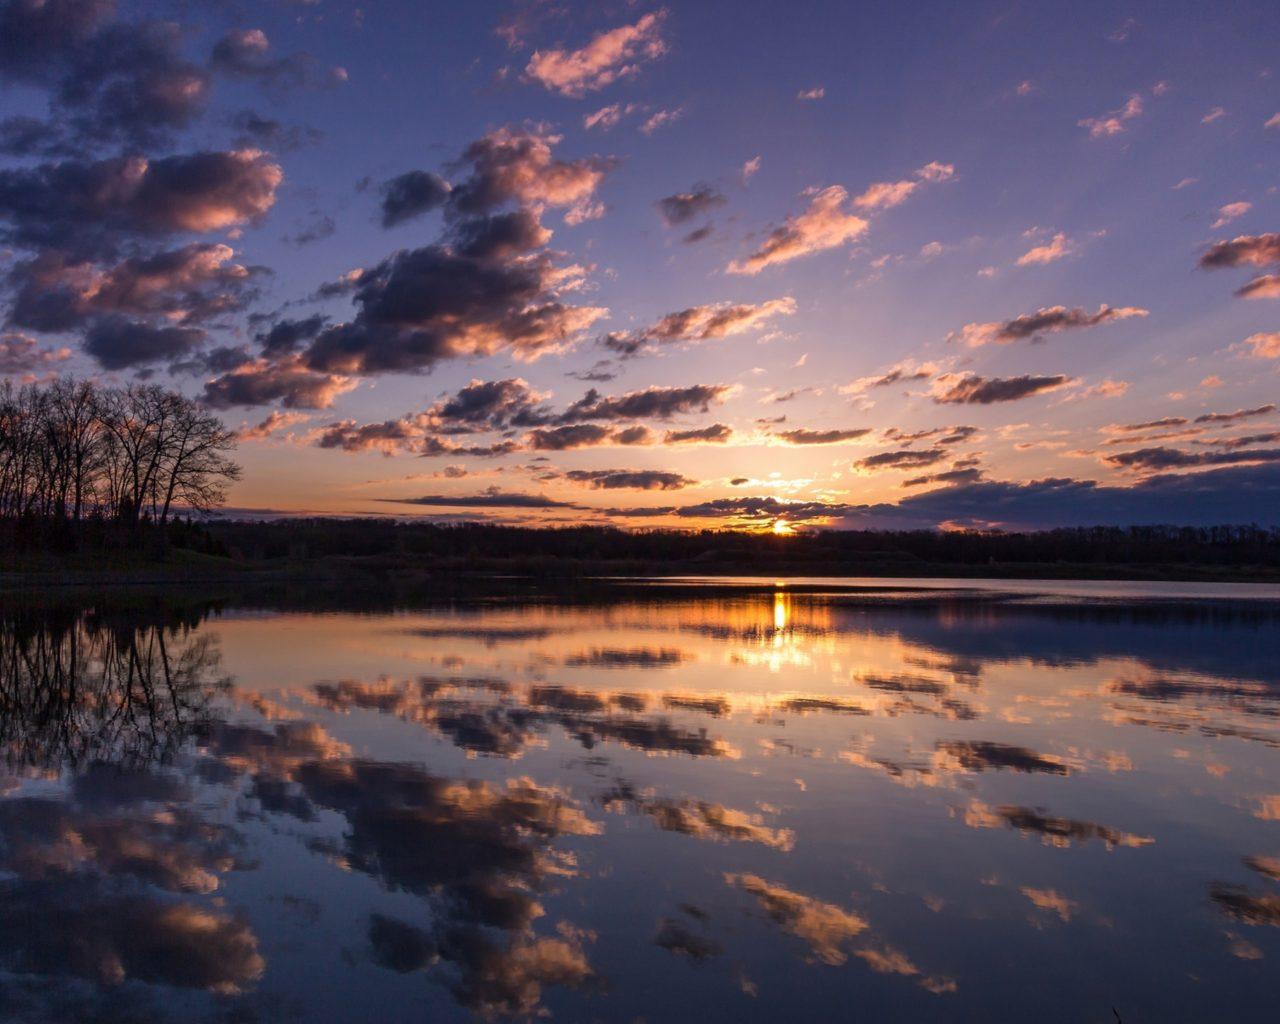 Falls Hd Wallpaper Free Download Sunrise Hd Wallpapers Lake Forest Dark Clouds